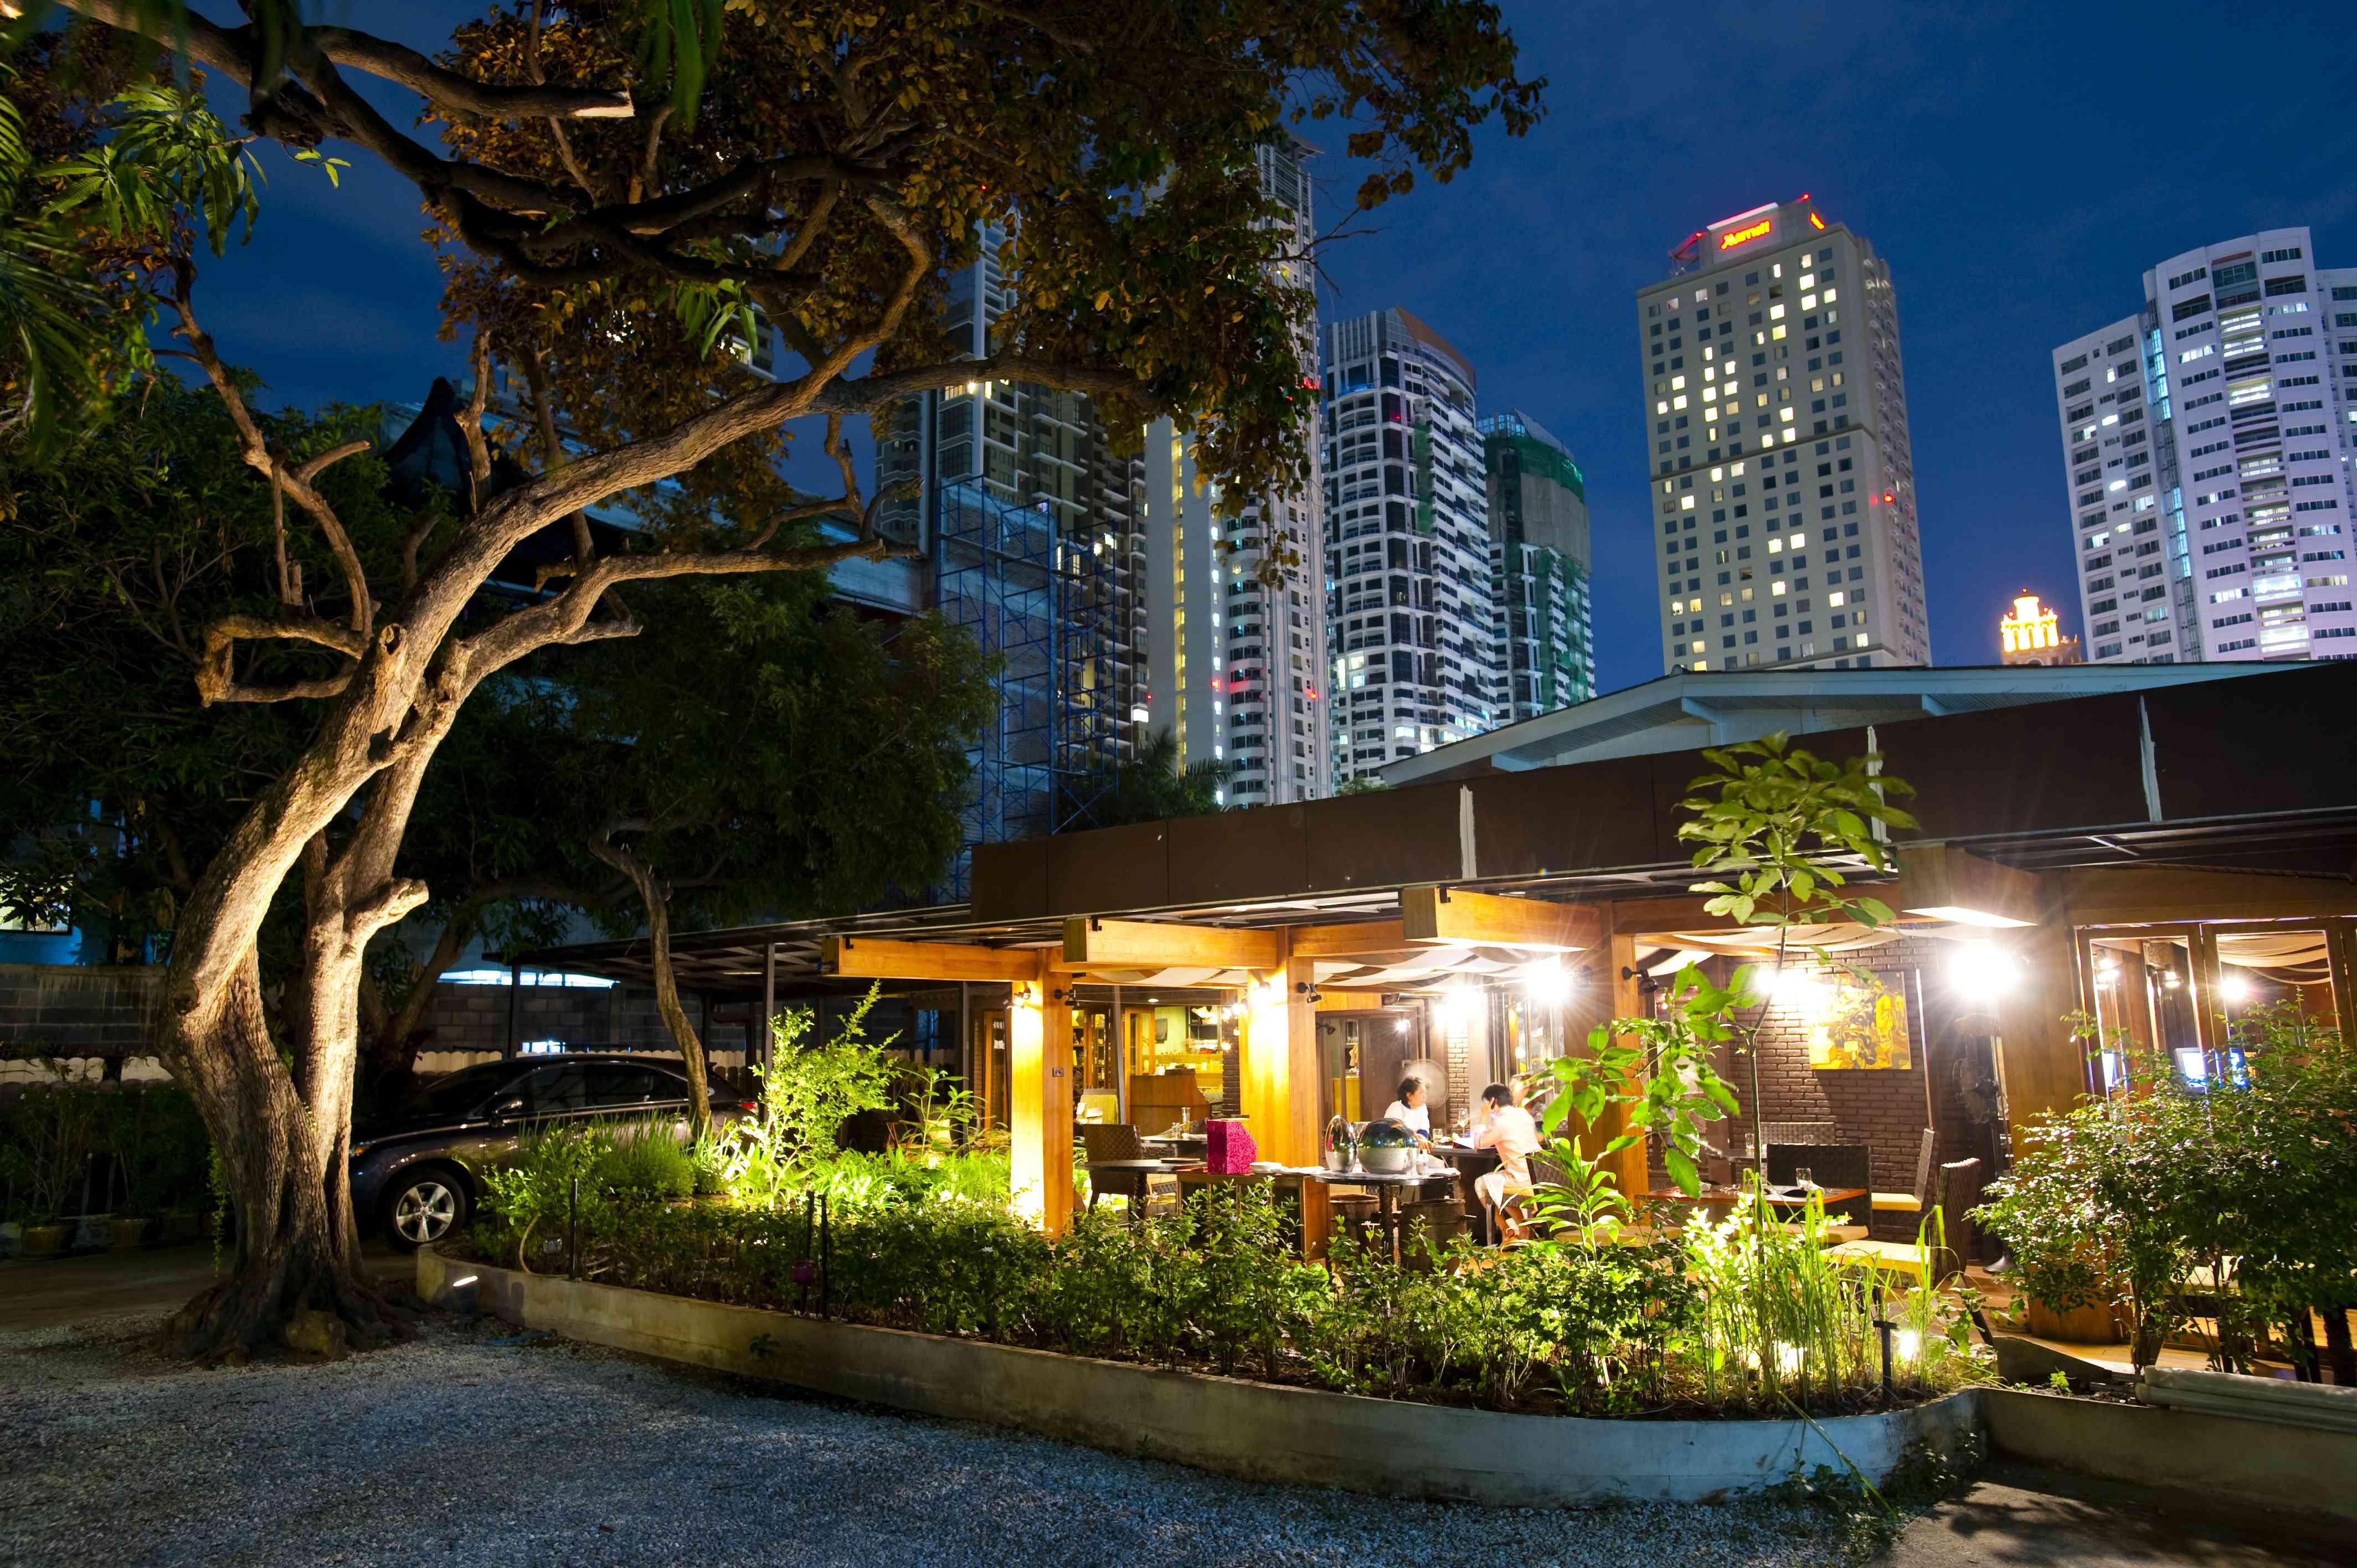 The Bo.Lan restaurant in Bangkok